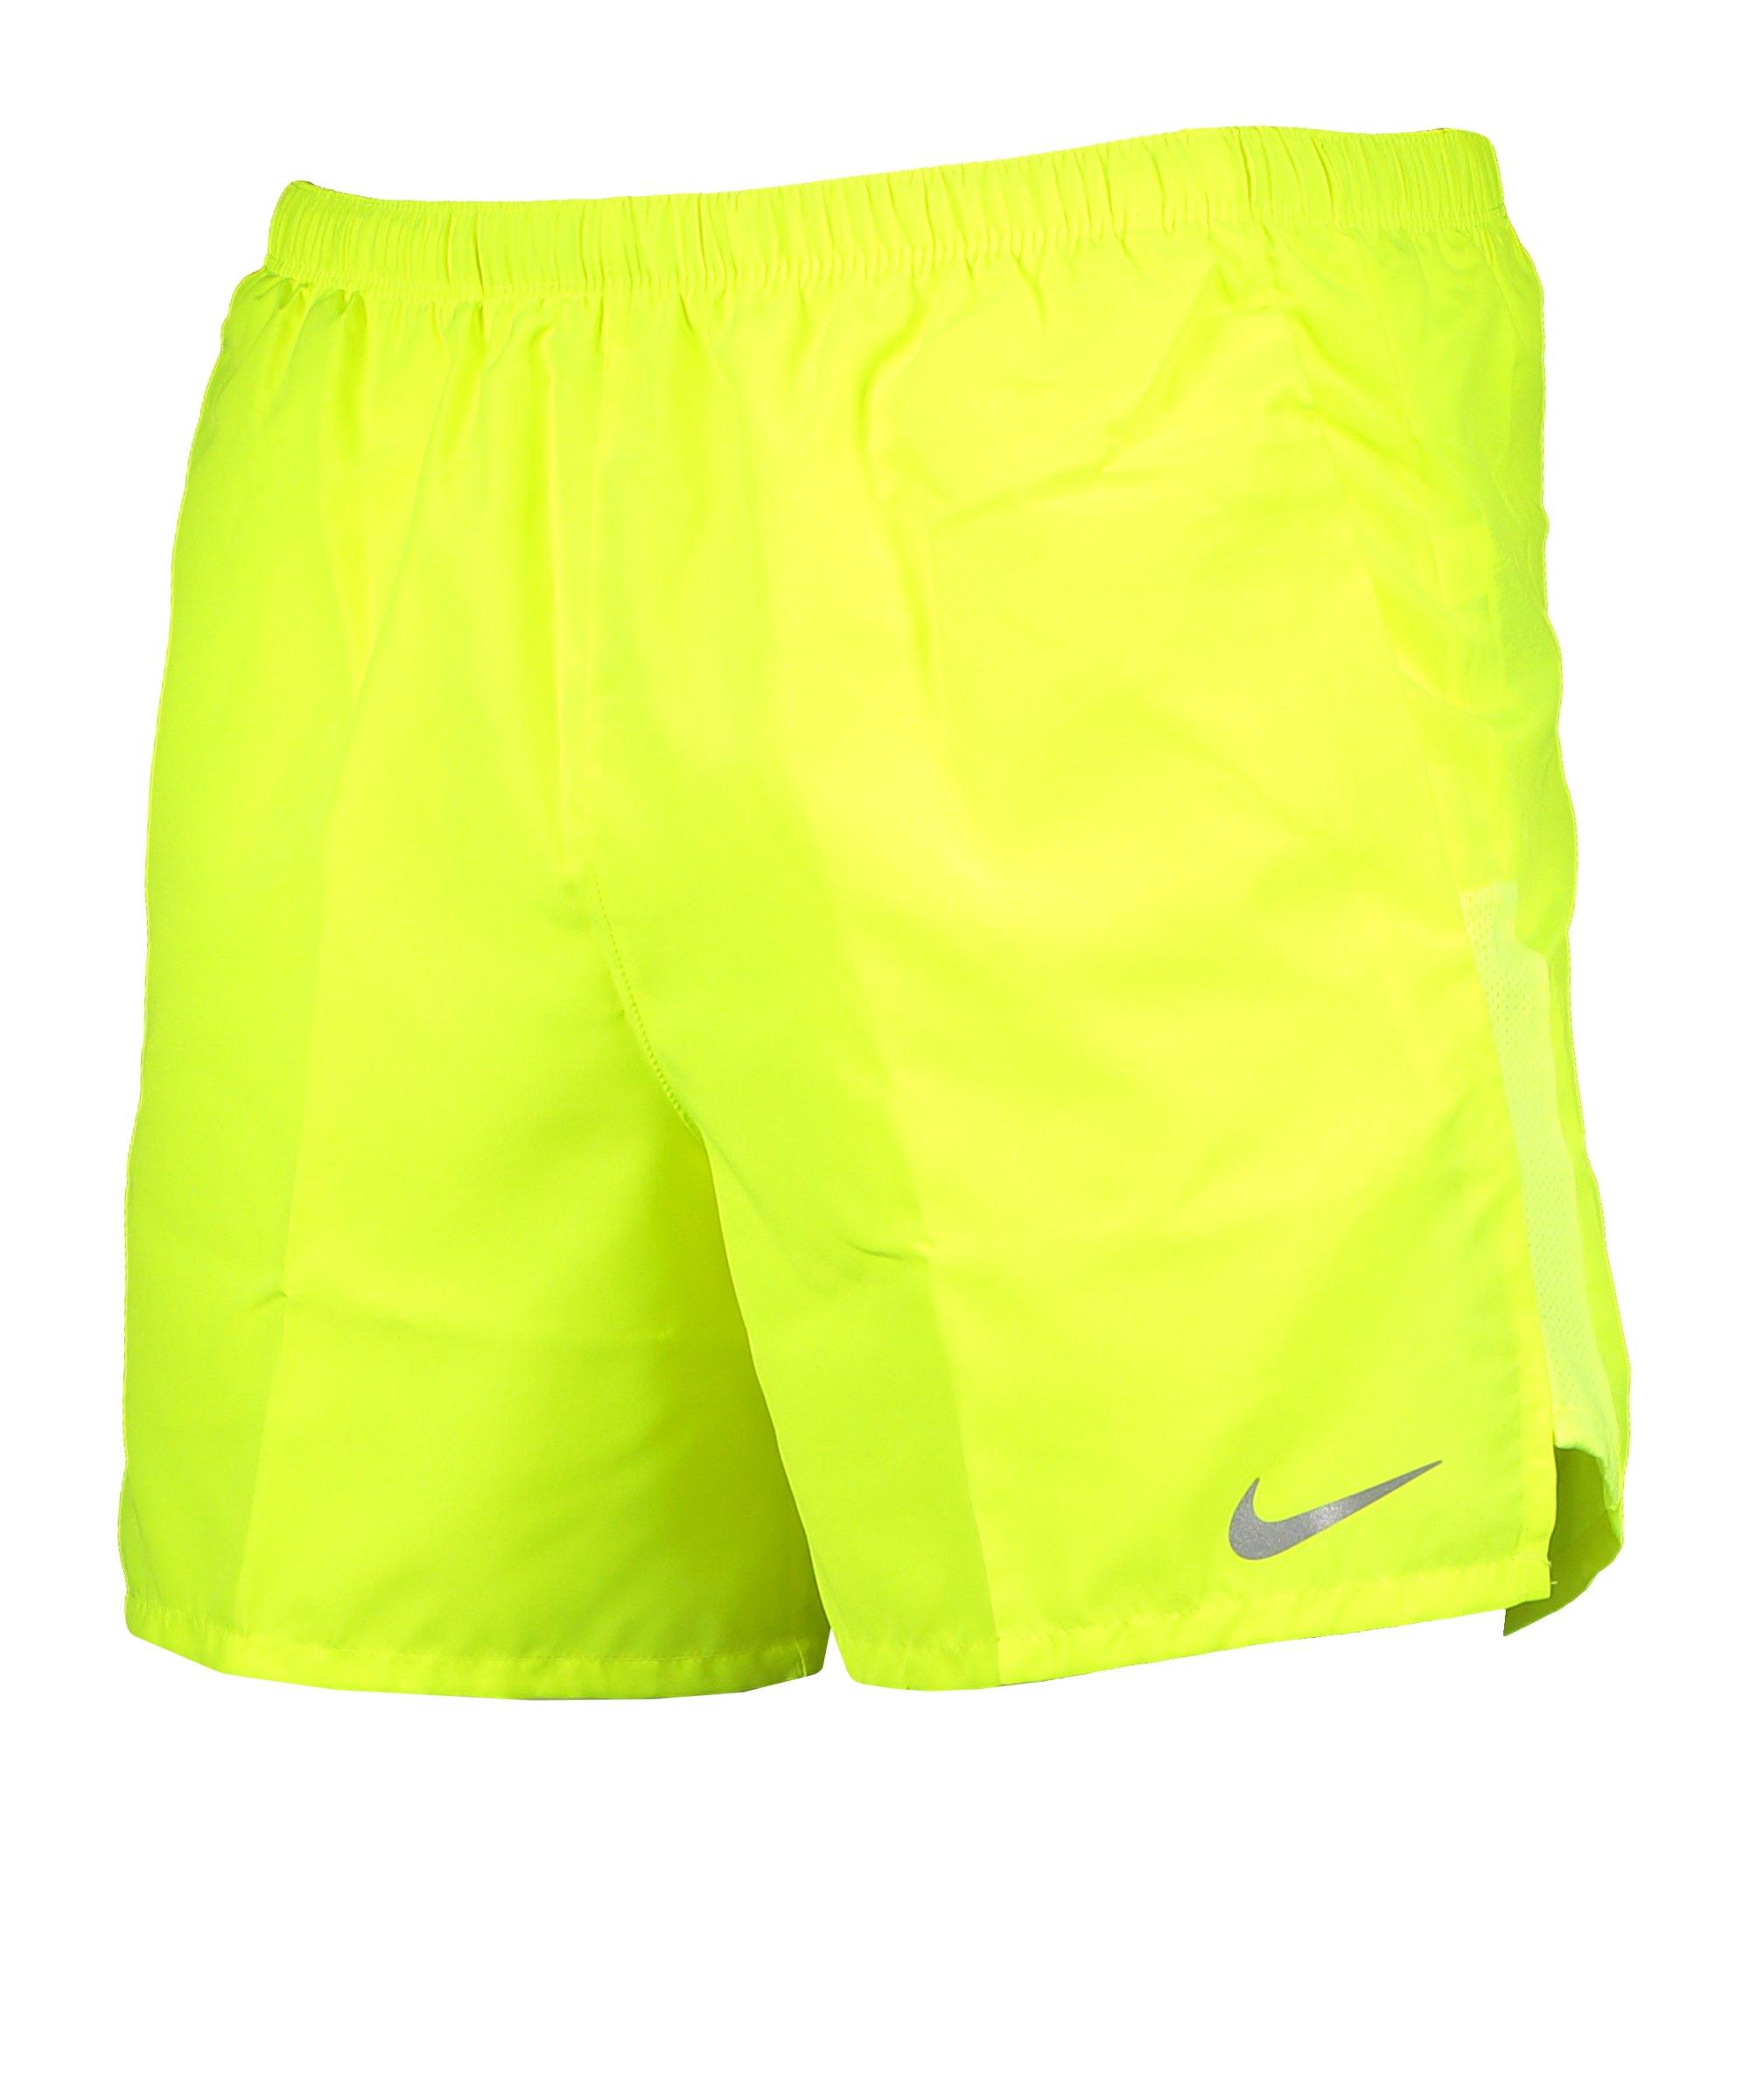 Nike Challenger Brief-Lined 5in Short Running F702 - gelb